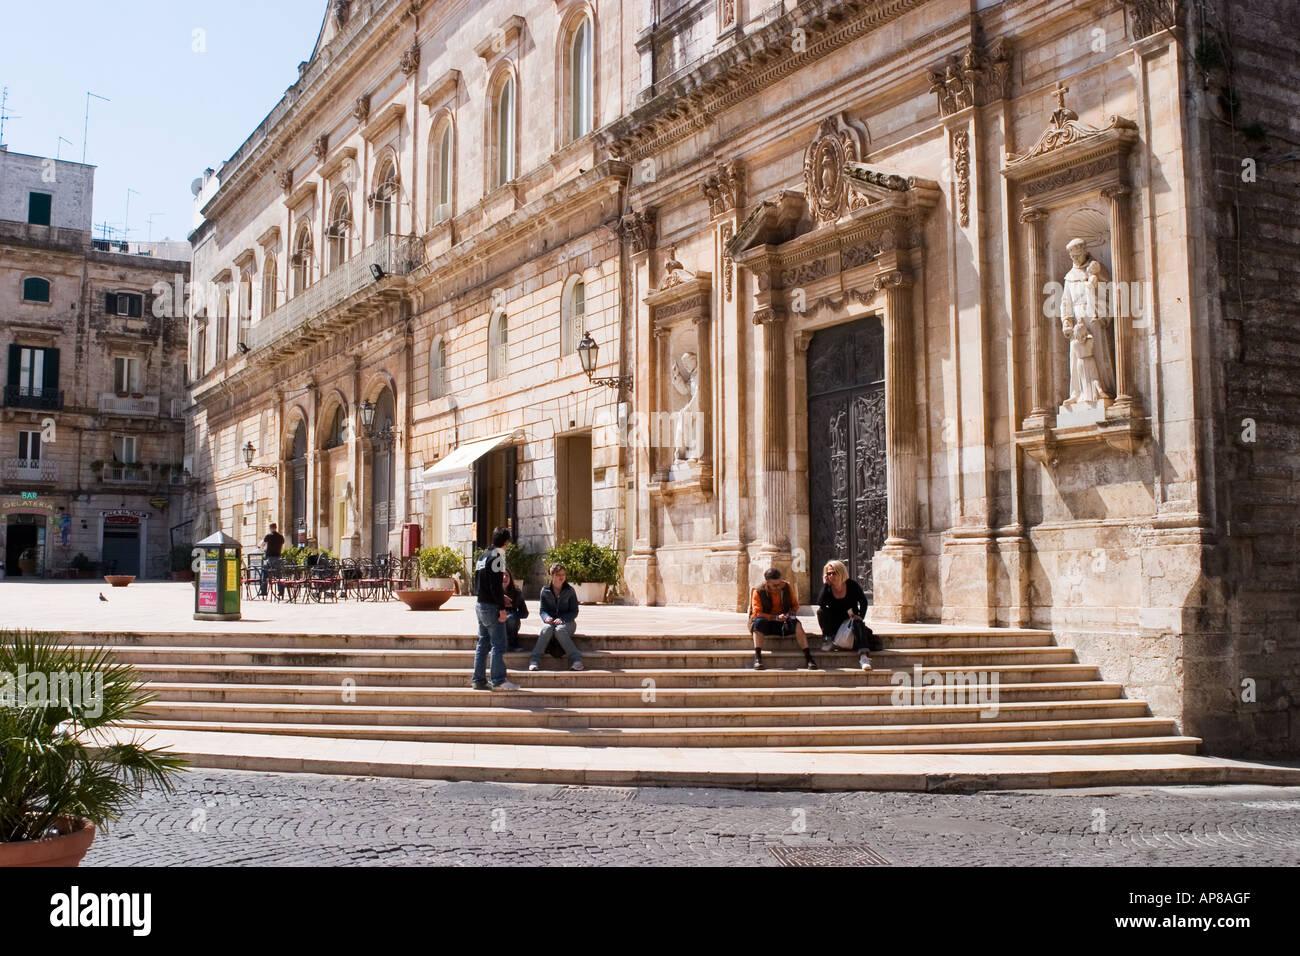 Piazza liberta and chiesa san francesco in Ostuni puglia italy - Stock Image